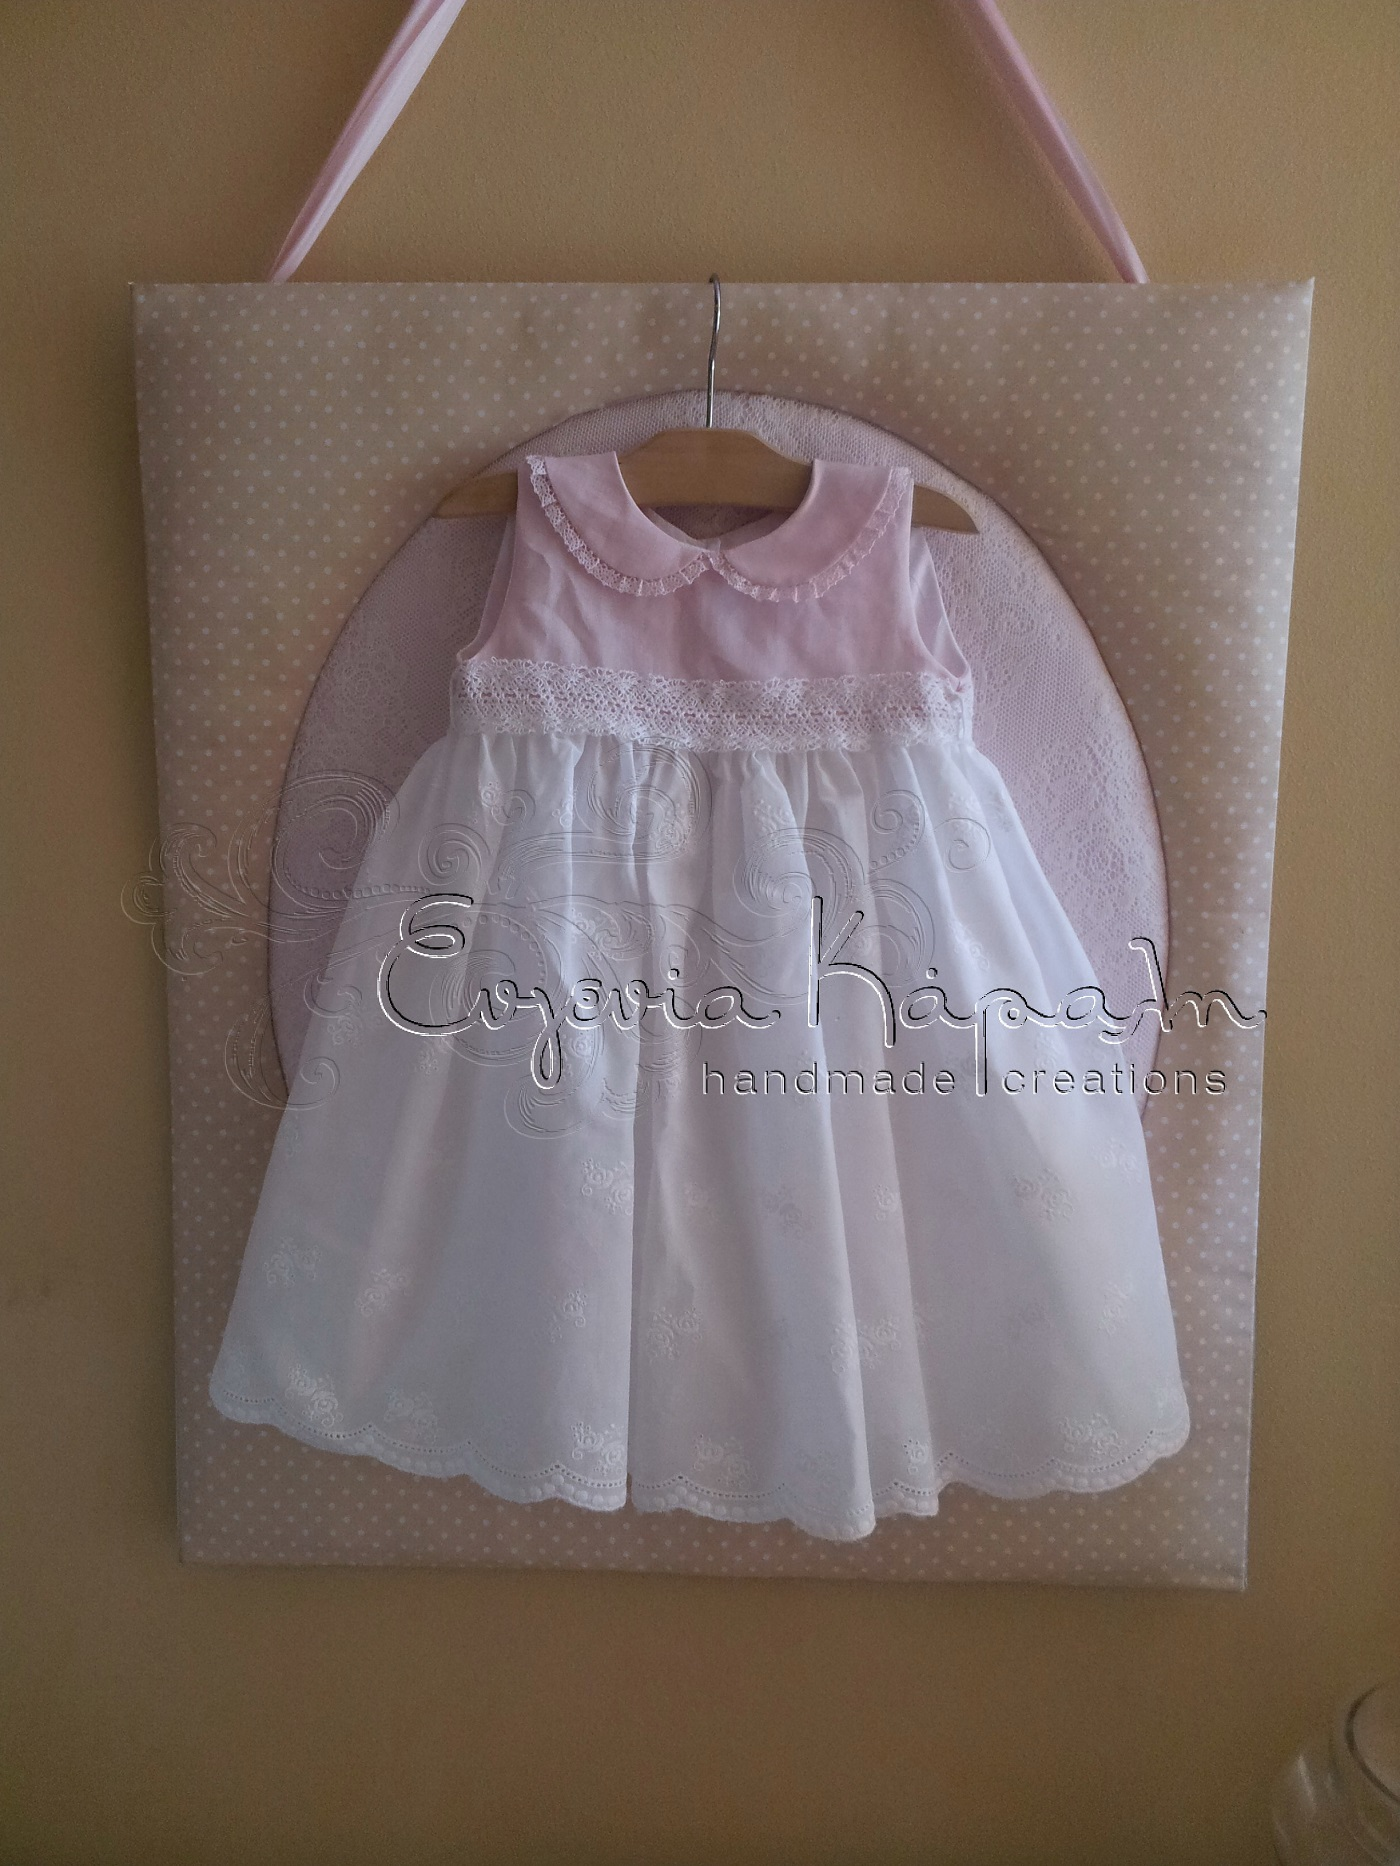 b9cdf00ce0a1 Φόρεμα βάπτισης απο καταπληκτική ελβετική δαντέλα broderie anglaise.  ΠροηγούμενοΕπόμενο. koritsi 6.jpg